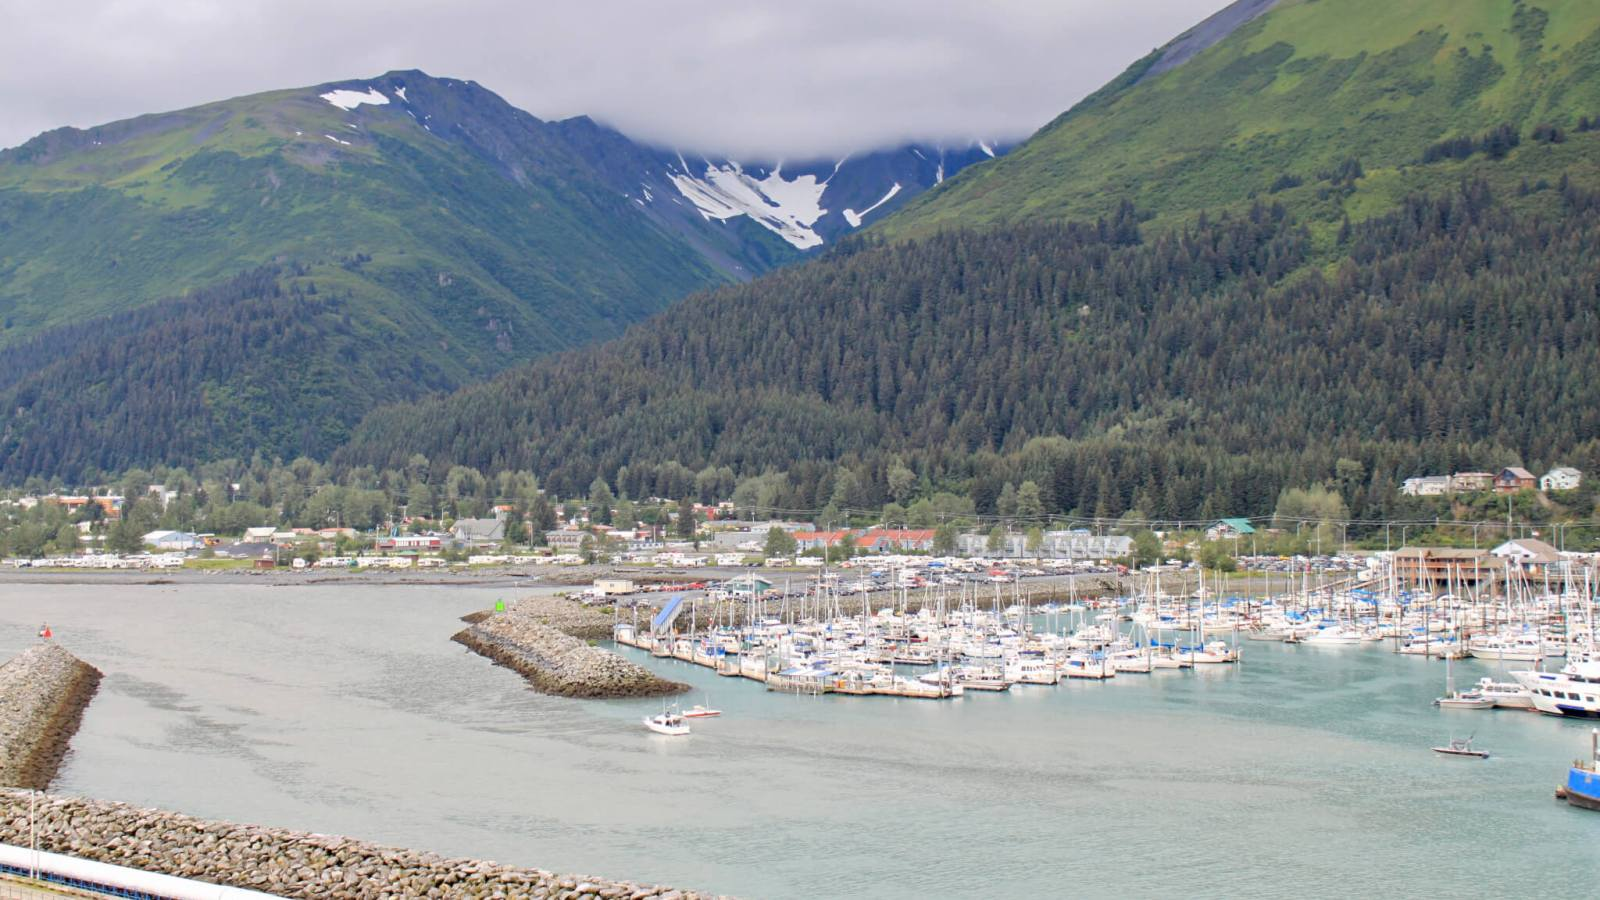 Marina and town of Seward, Alaska